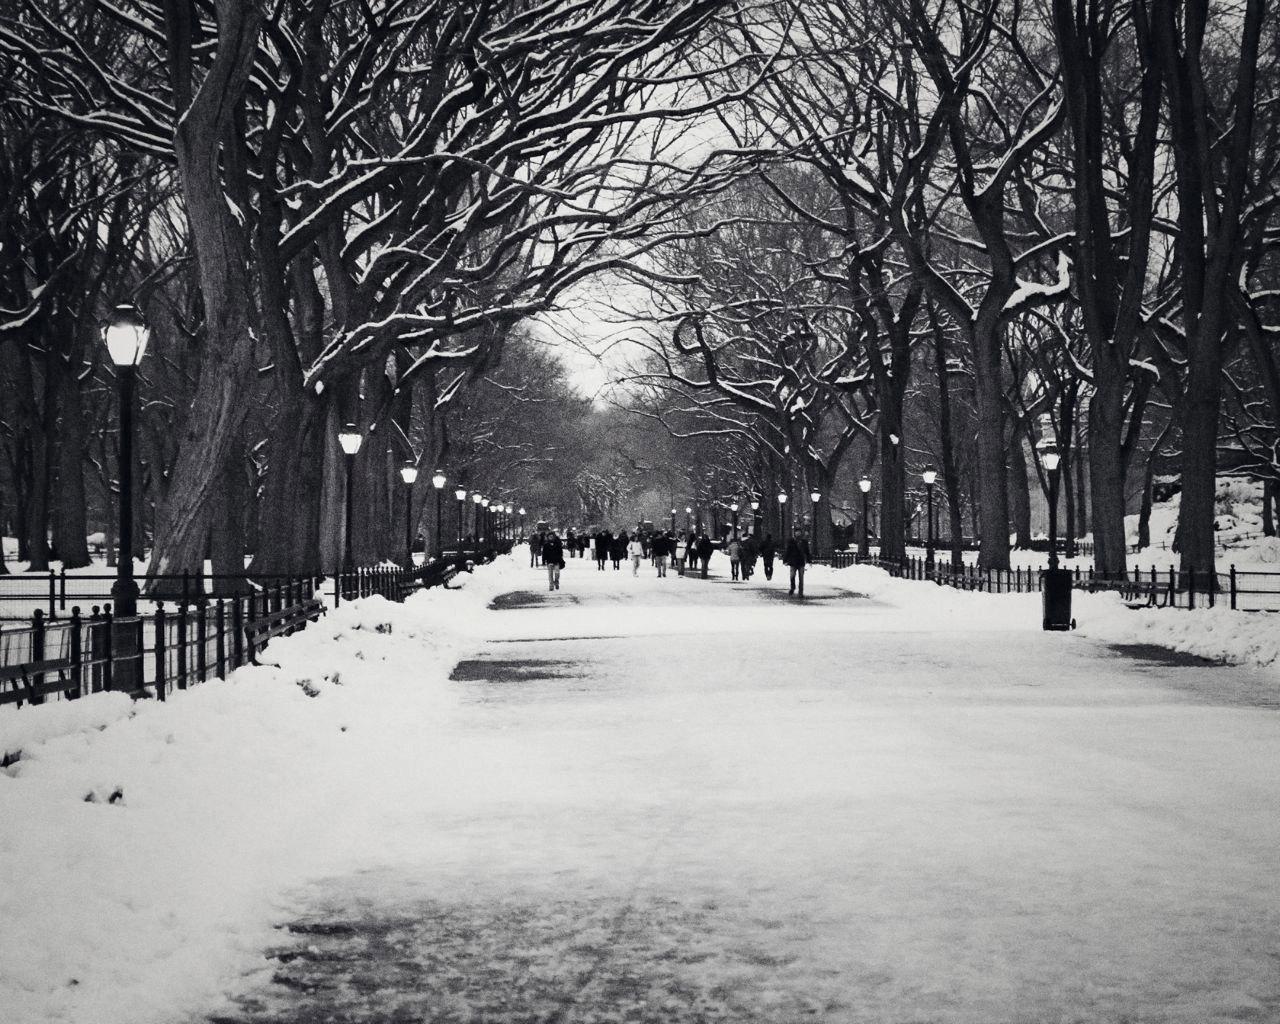 Iphone 5 Falling Snow Wallpaper Black Winter 16 Free Hd Wallpaper Hdblackwallpaper Com